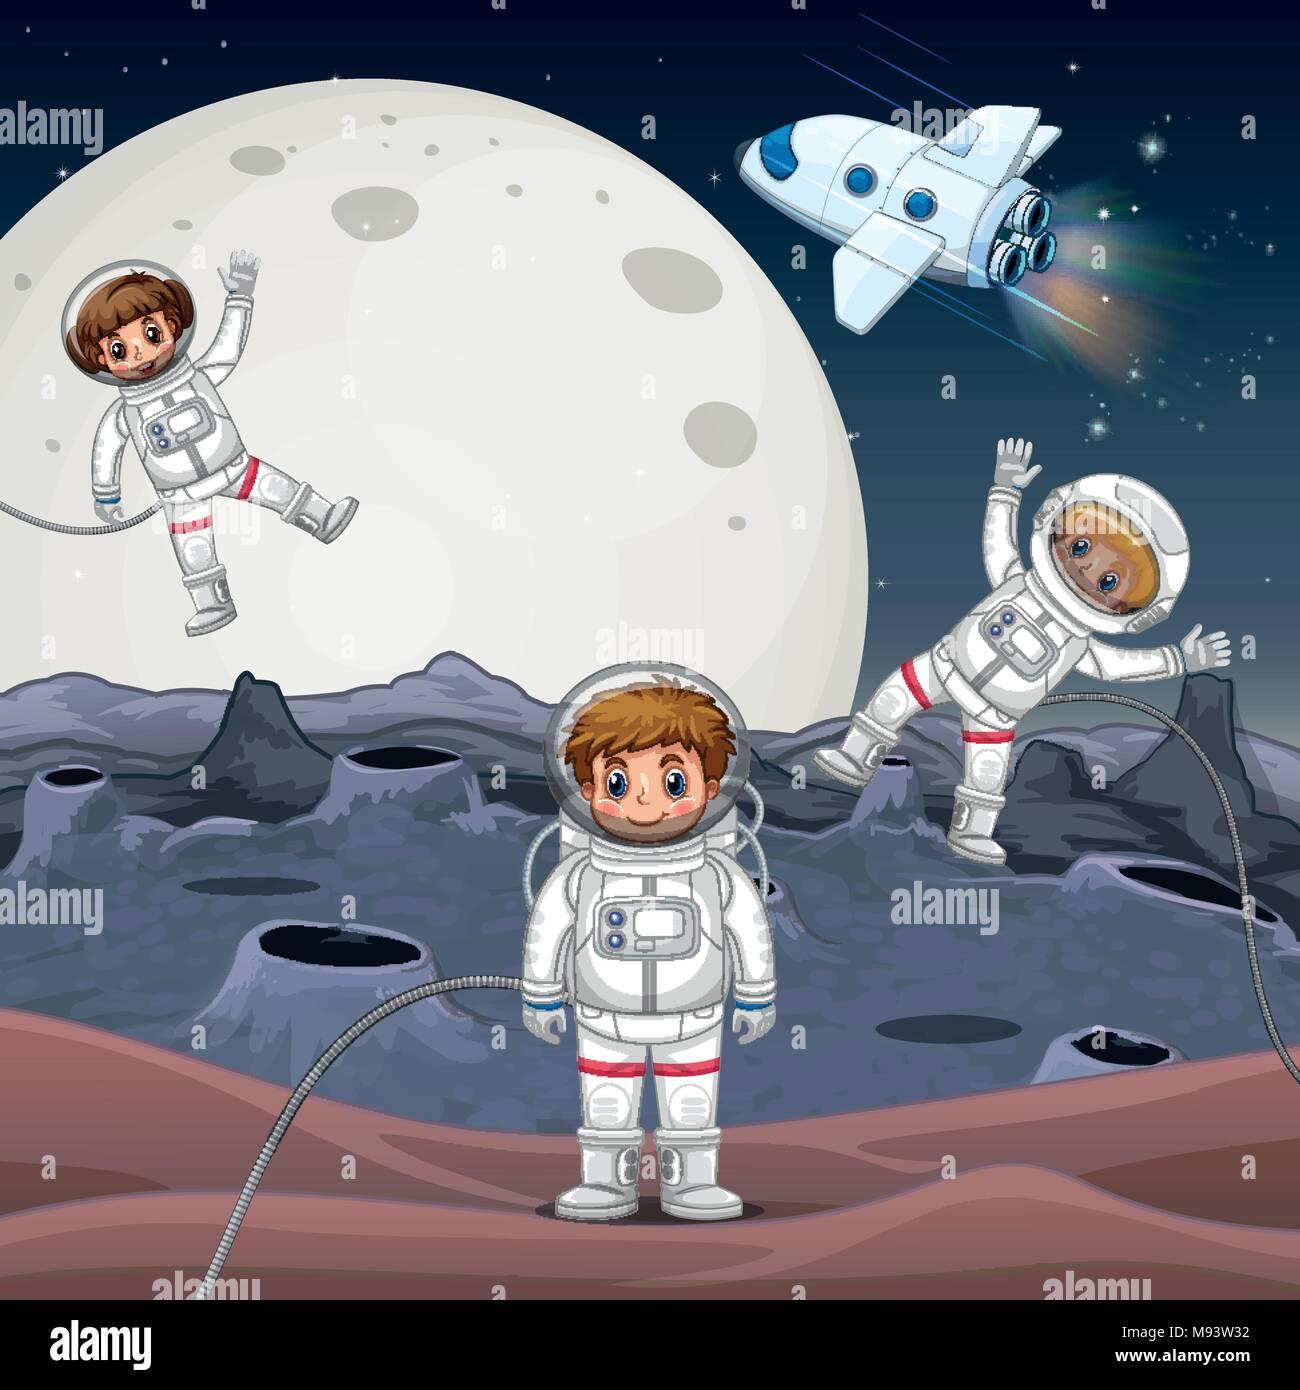 Three astronauts exploring space illustration - Stock Vector